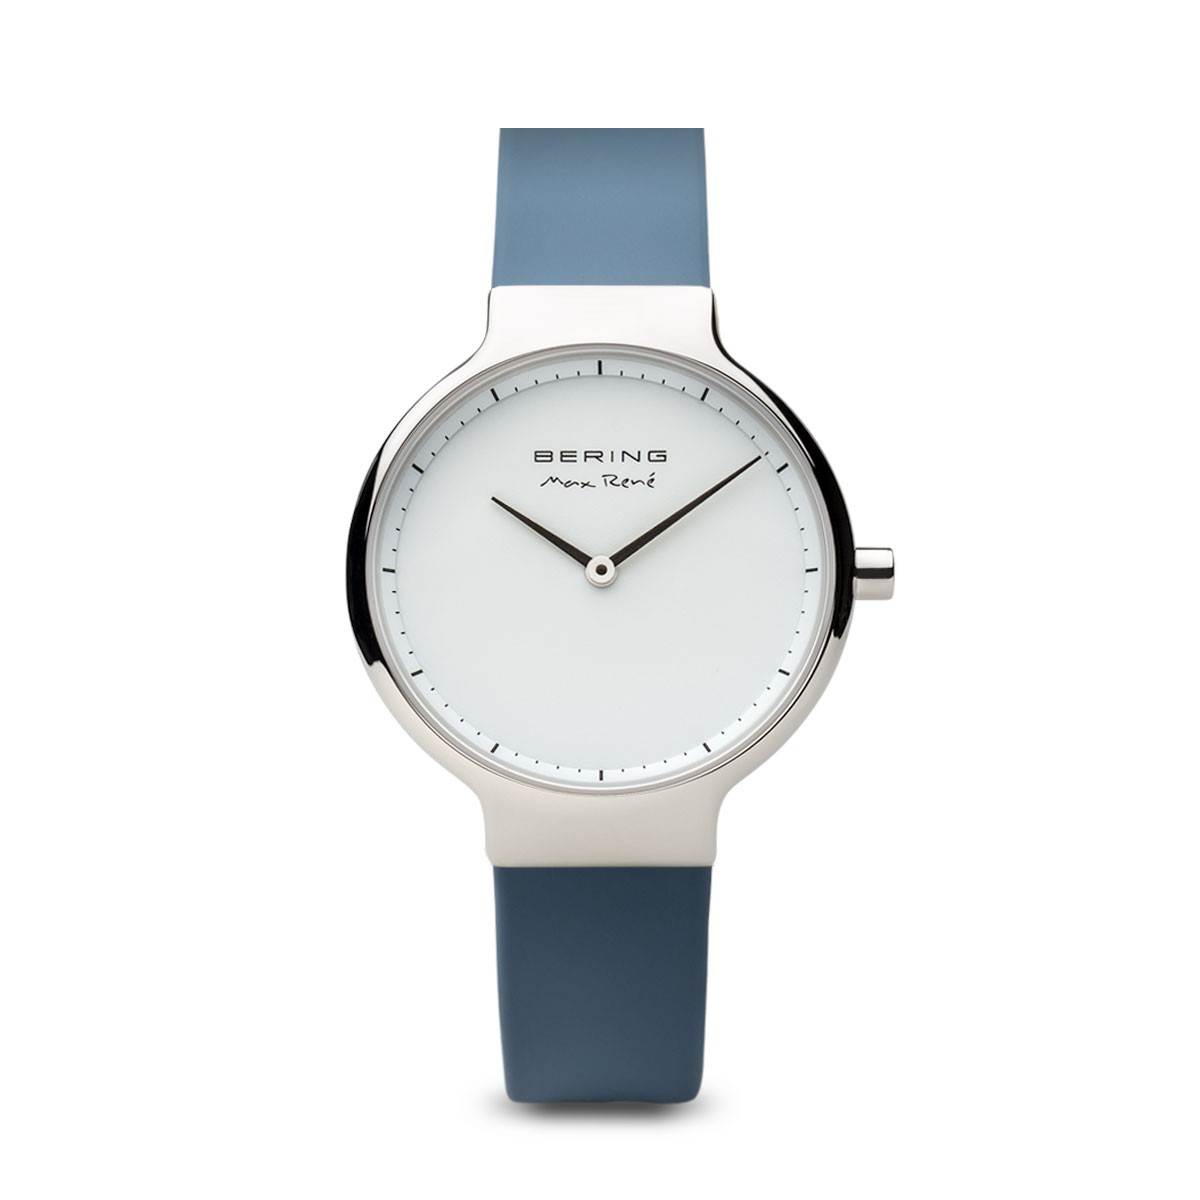 Bering Max René kék női óra - 15531-700 f6f27928cc